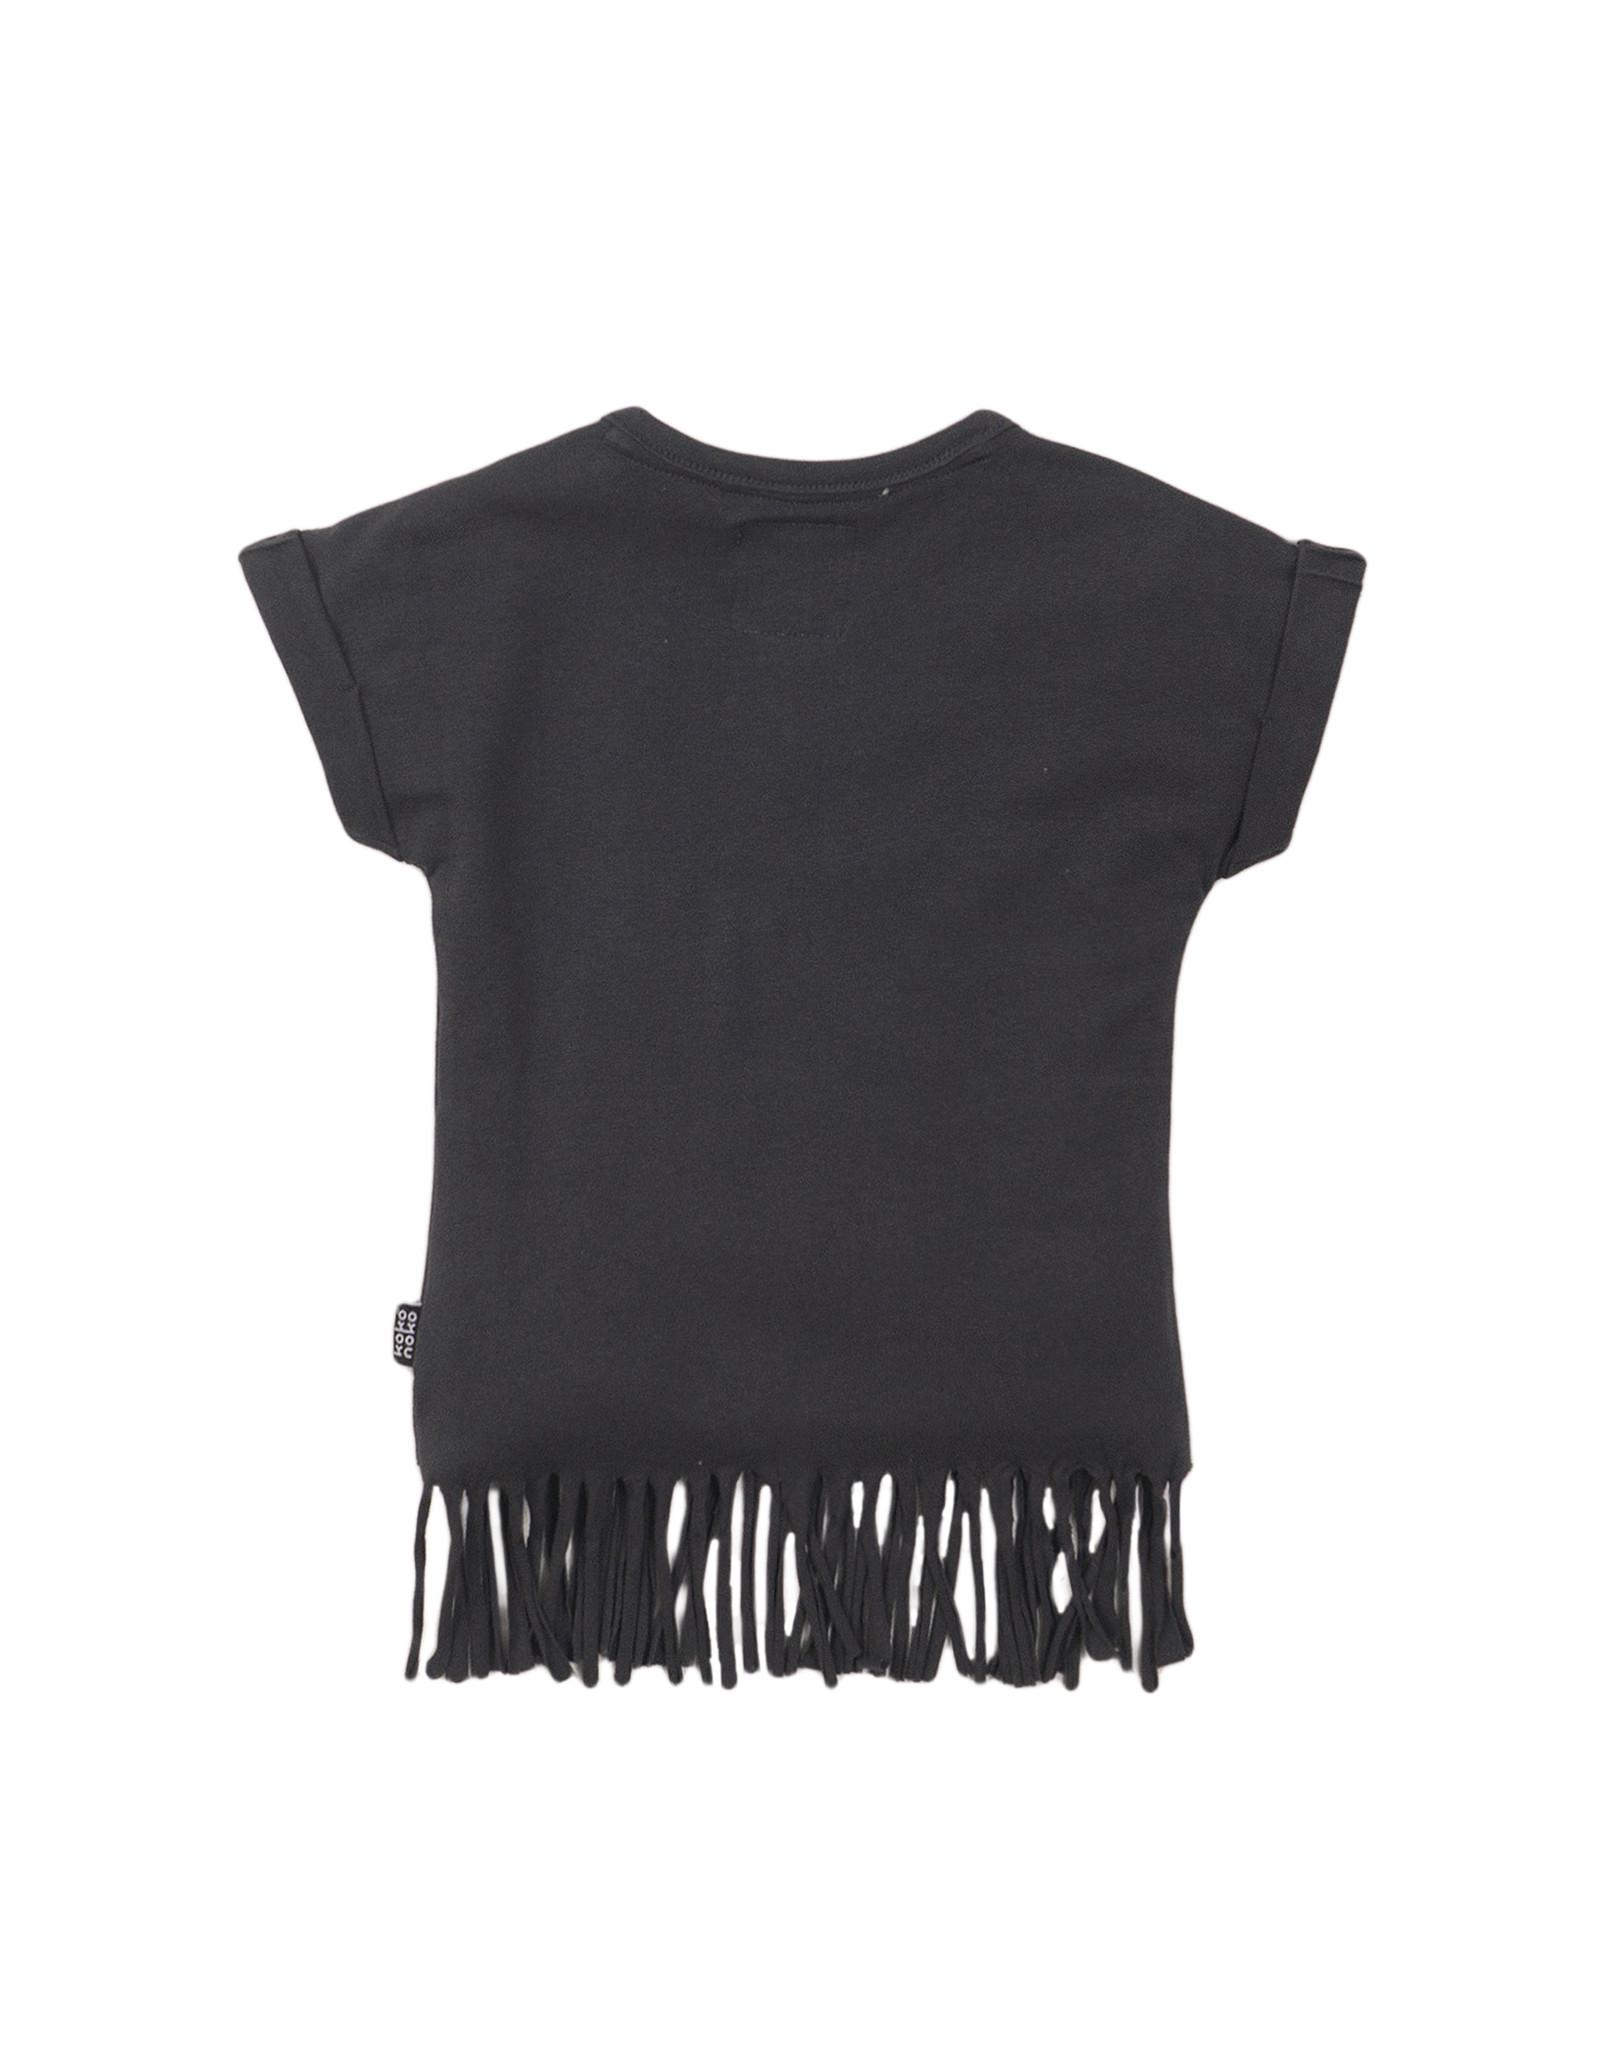 Koko Noko T-shirt shsl, Dark grey, SS21